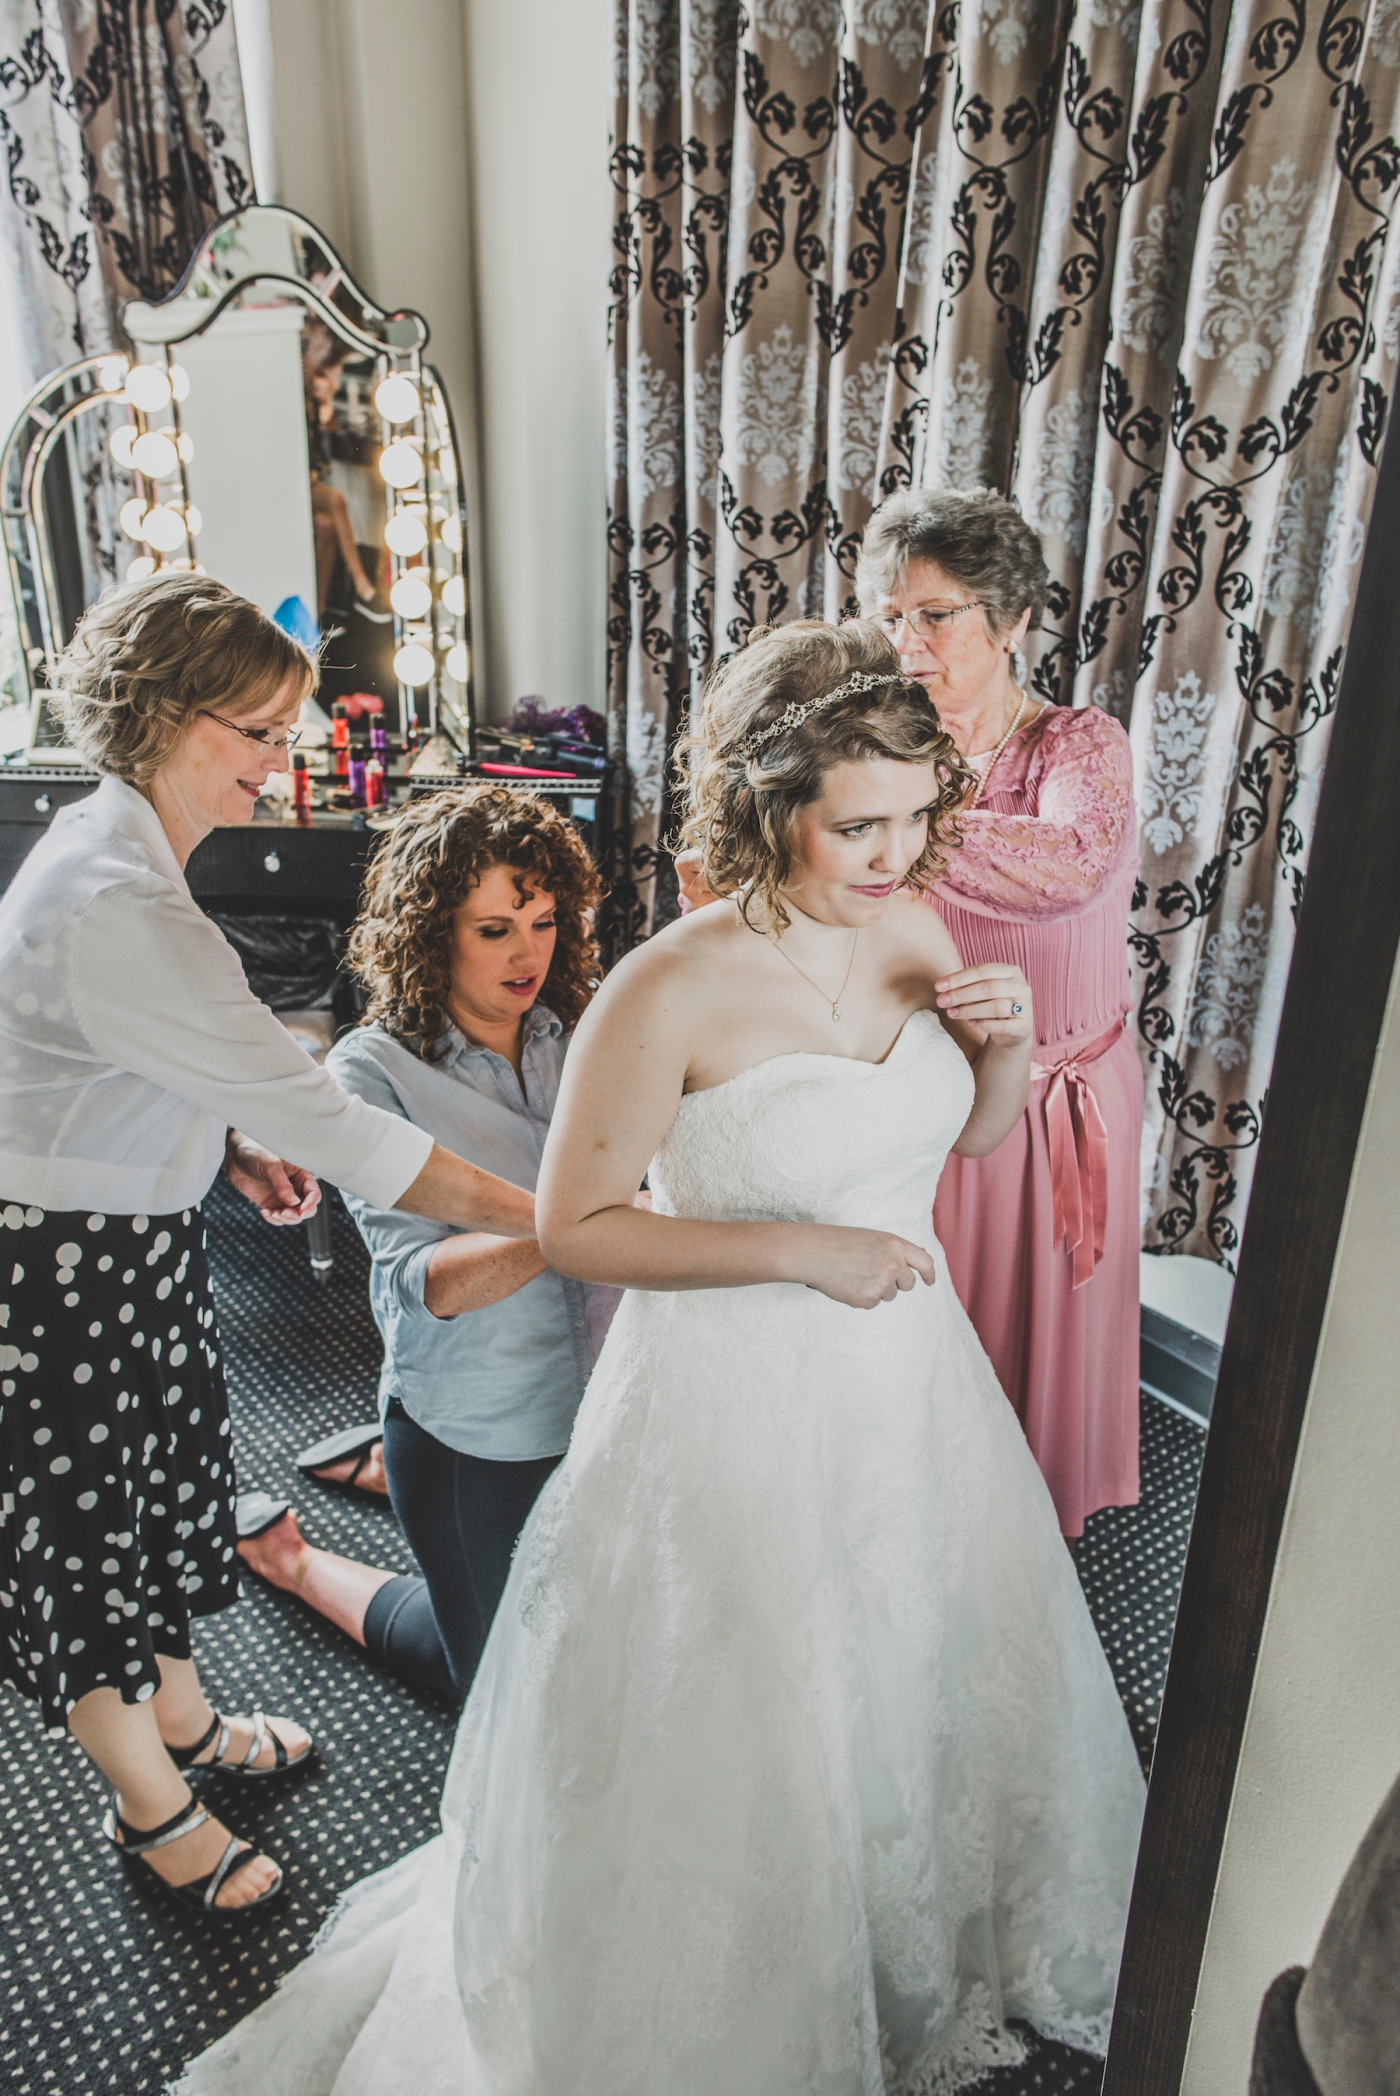 DSC_1877Everett_Wedding_Ballroom_Jane_Speleers_photography_Rachel_and_Edmund_Getting_ready_2017